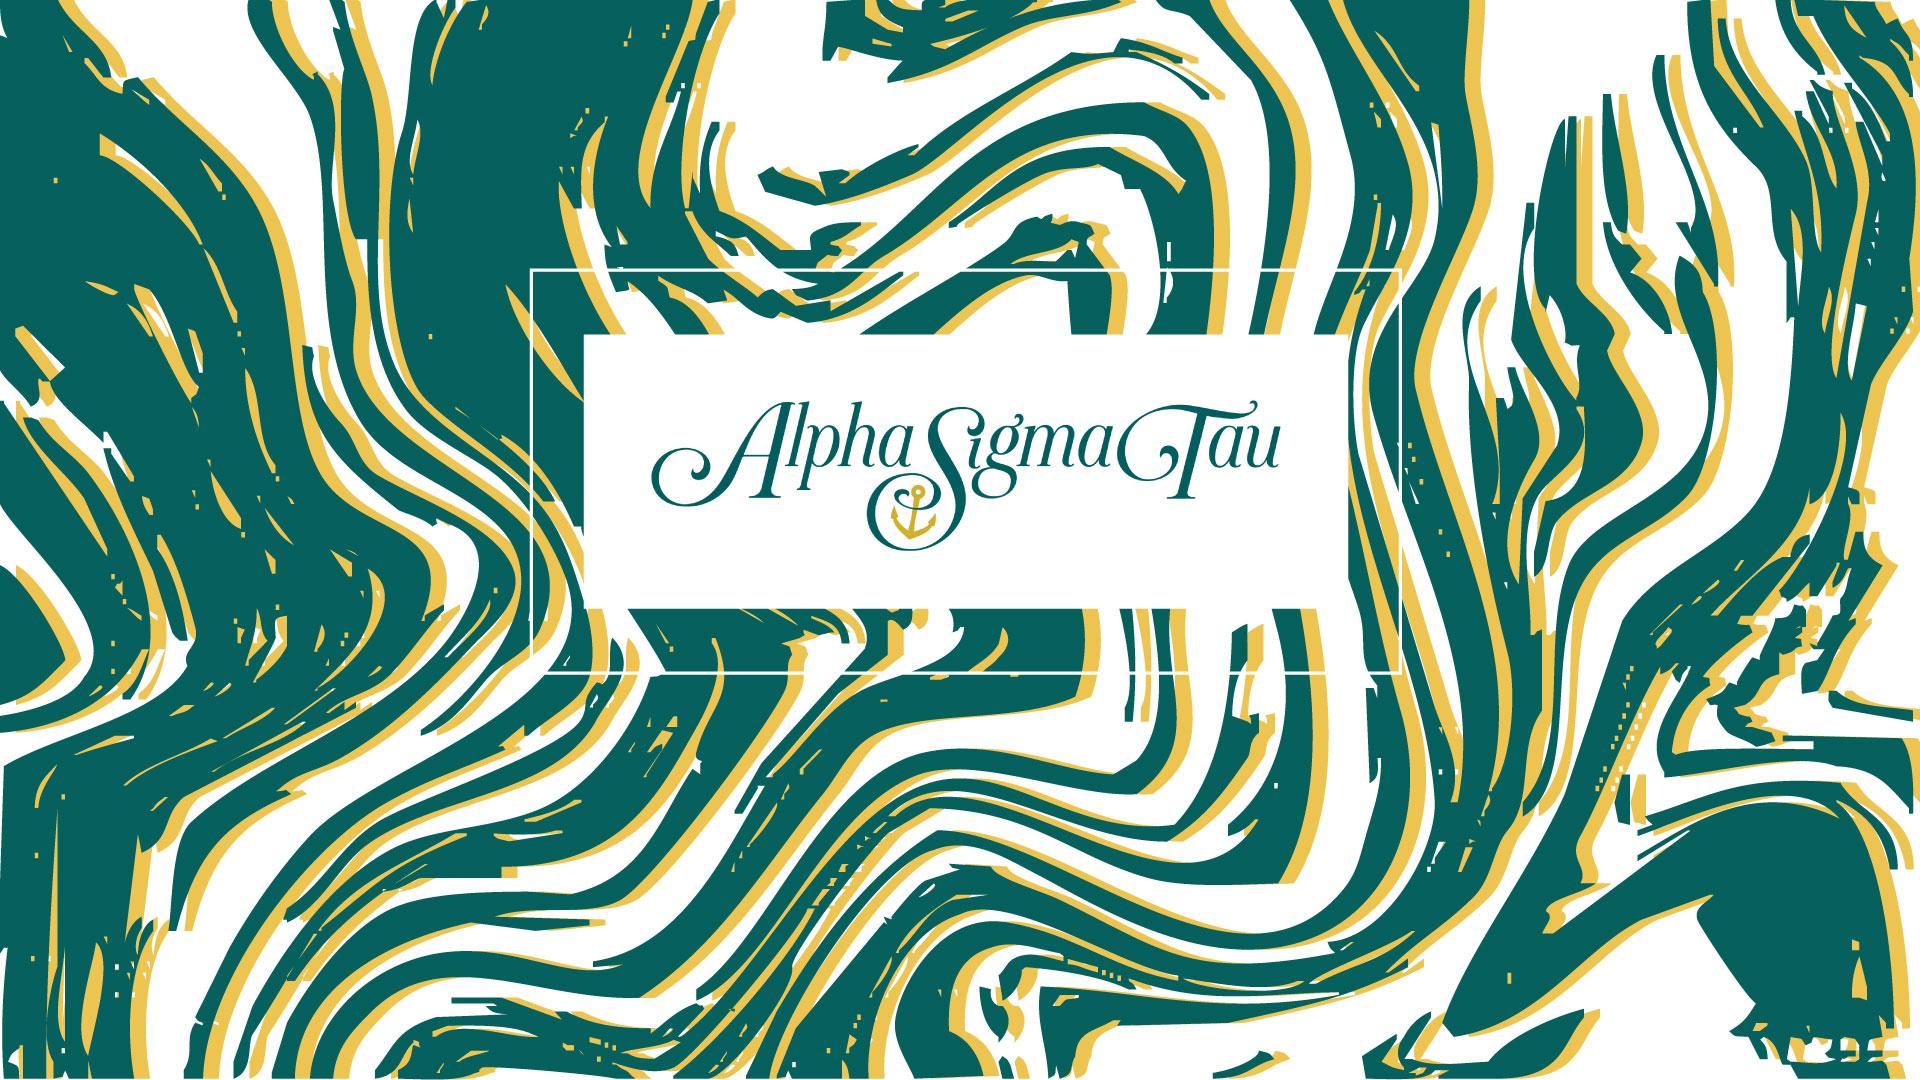 wallpapers - alpha sigma tau